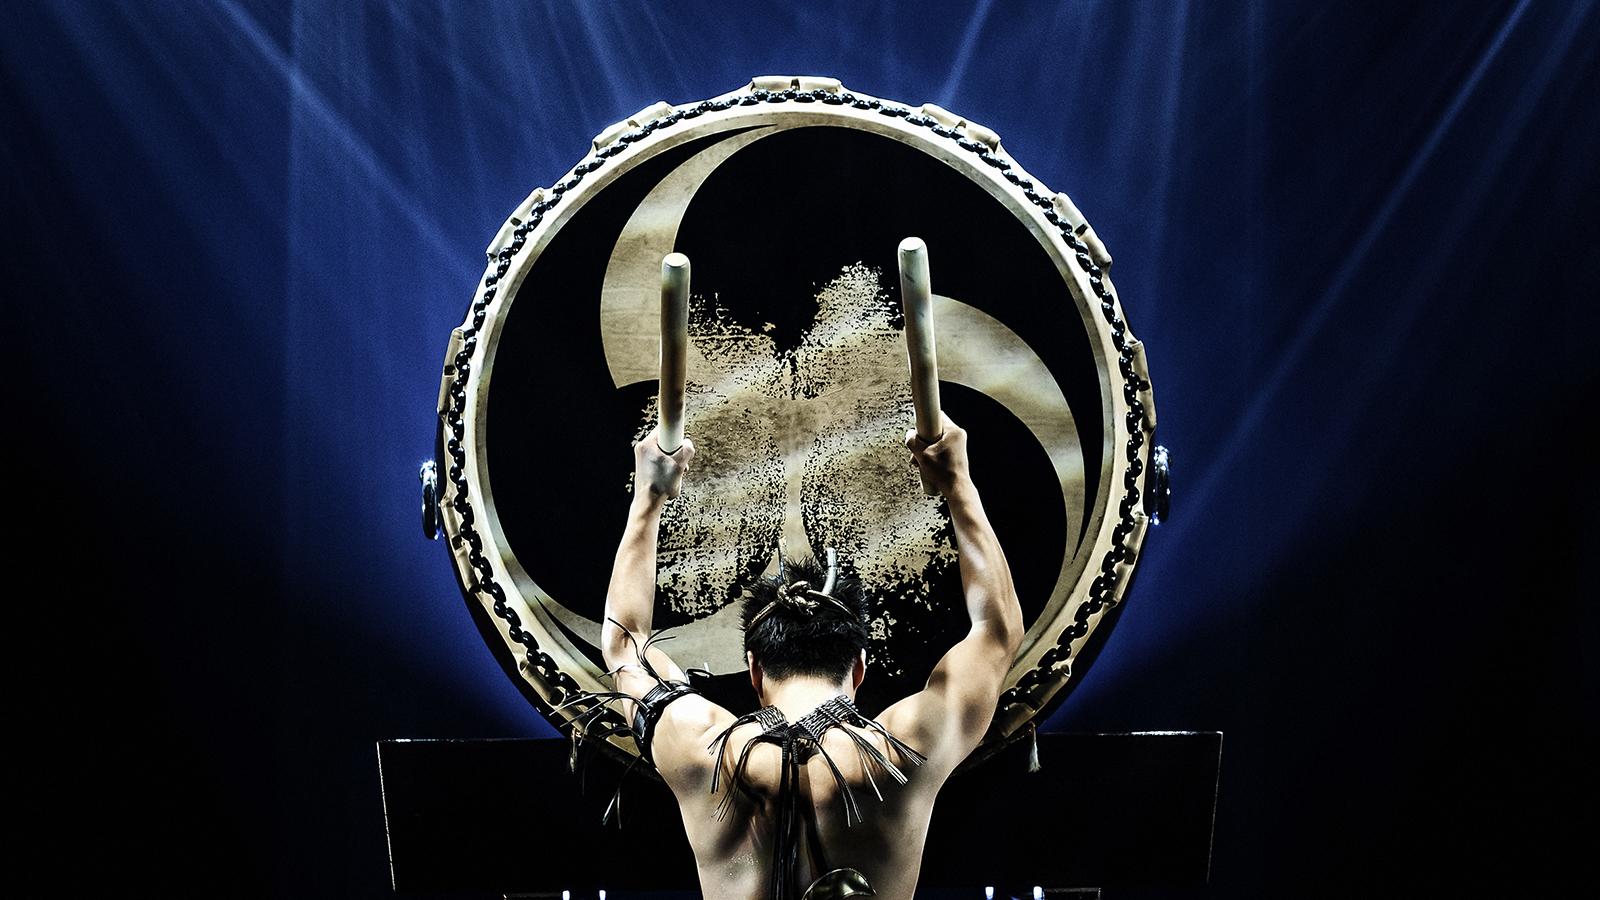 Tao: Drum Heart